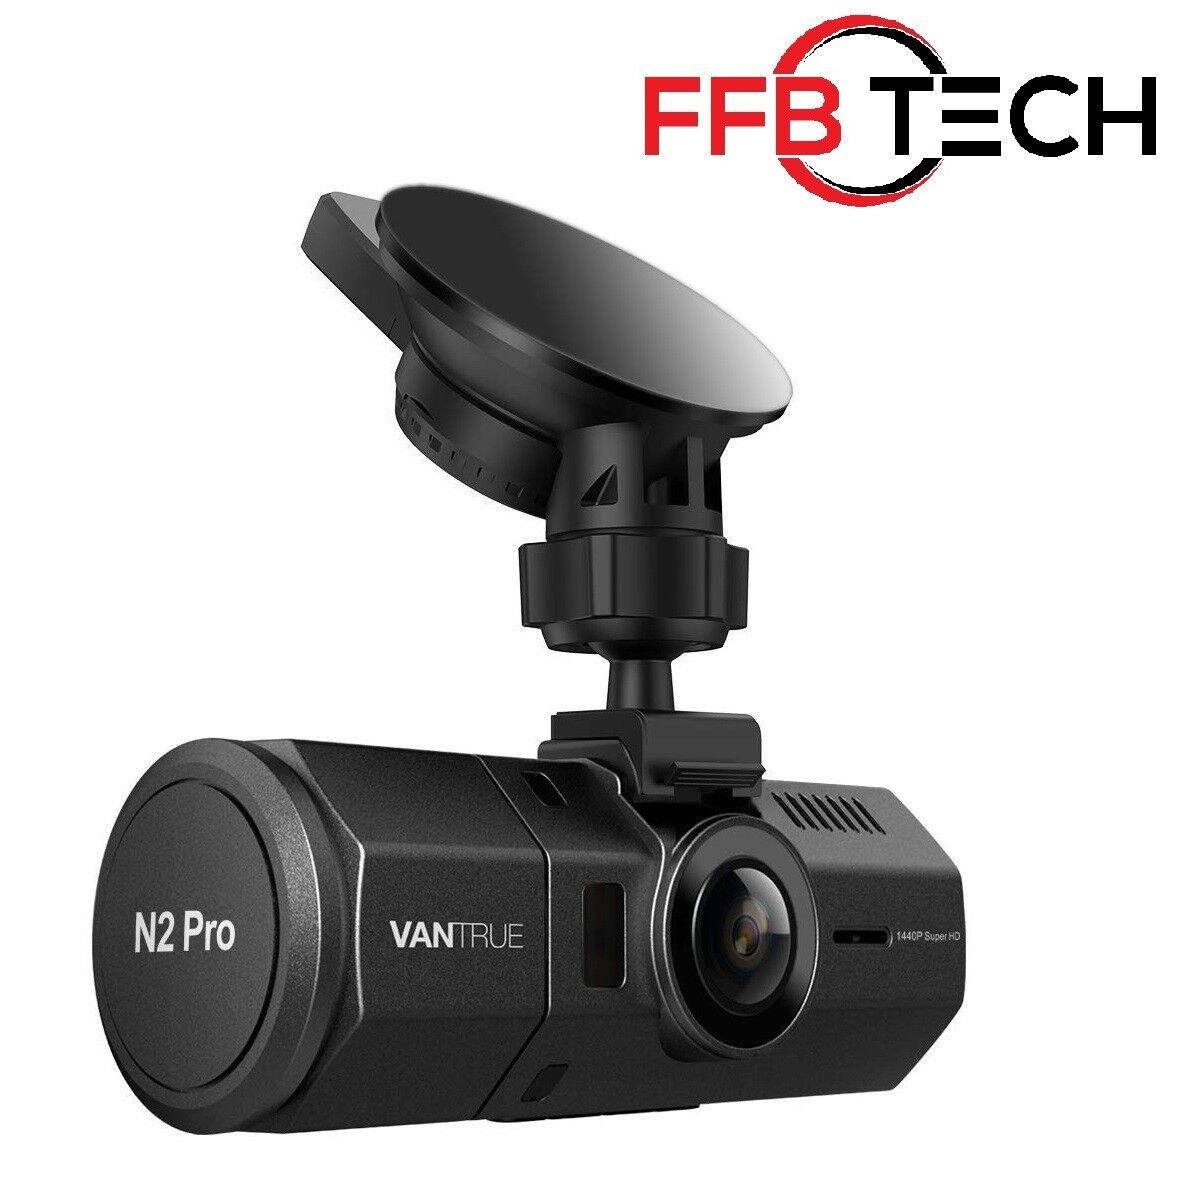 s-l1600 Vantrue N2 PRO-Dual Dash Cam-Infrared Night Vision 256GB Support/Upgraded Mount